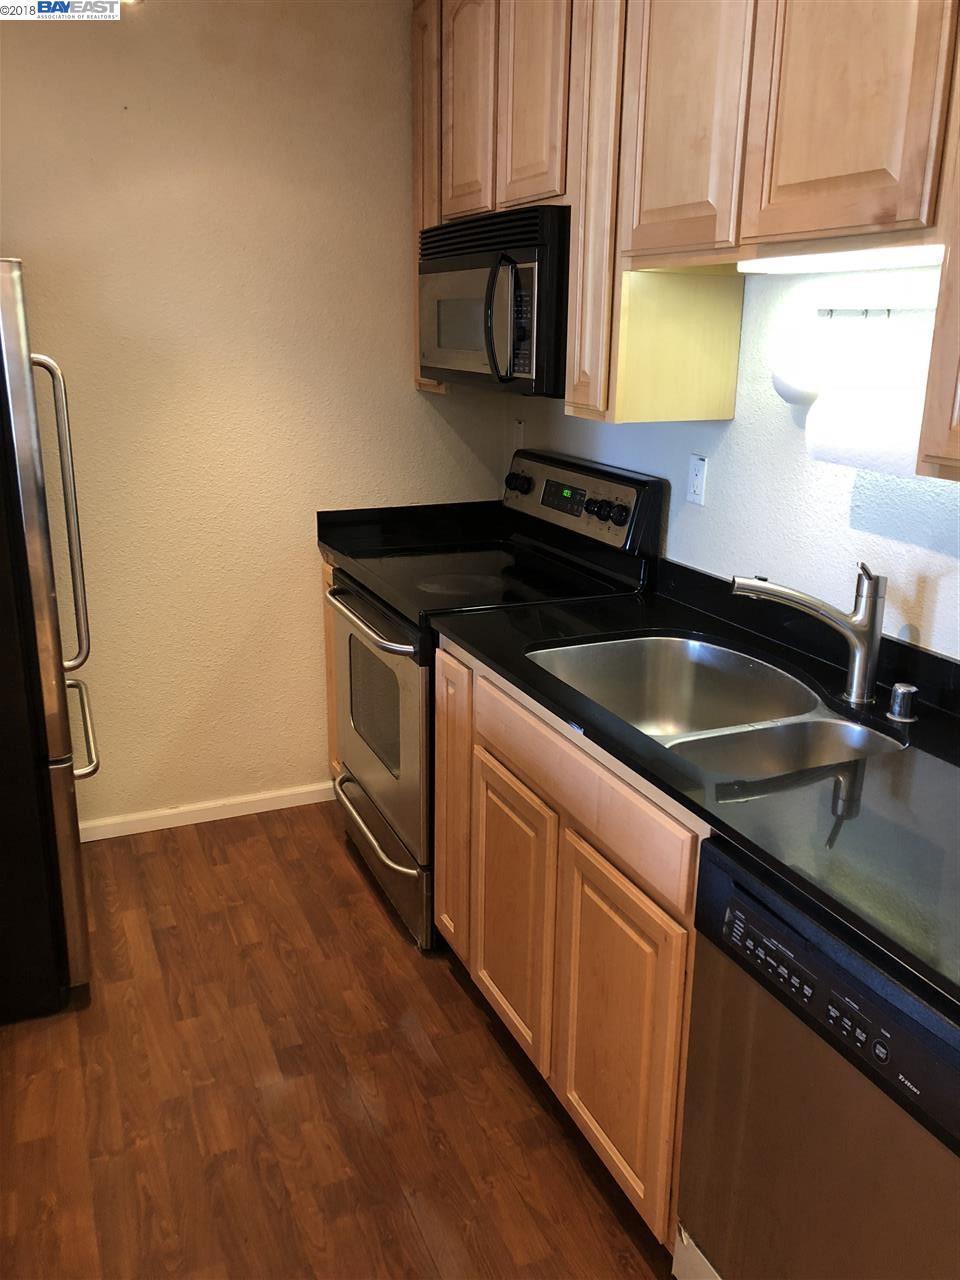 Additional photo for property listing at 155 Sharene Lane 155 Sharene Lane Walnut Creek, カリフォルニア 94596 アメリカ合衆国